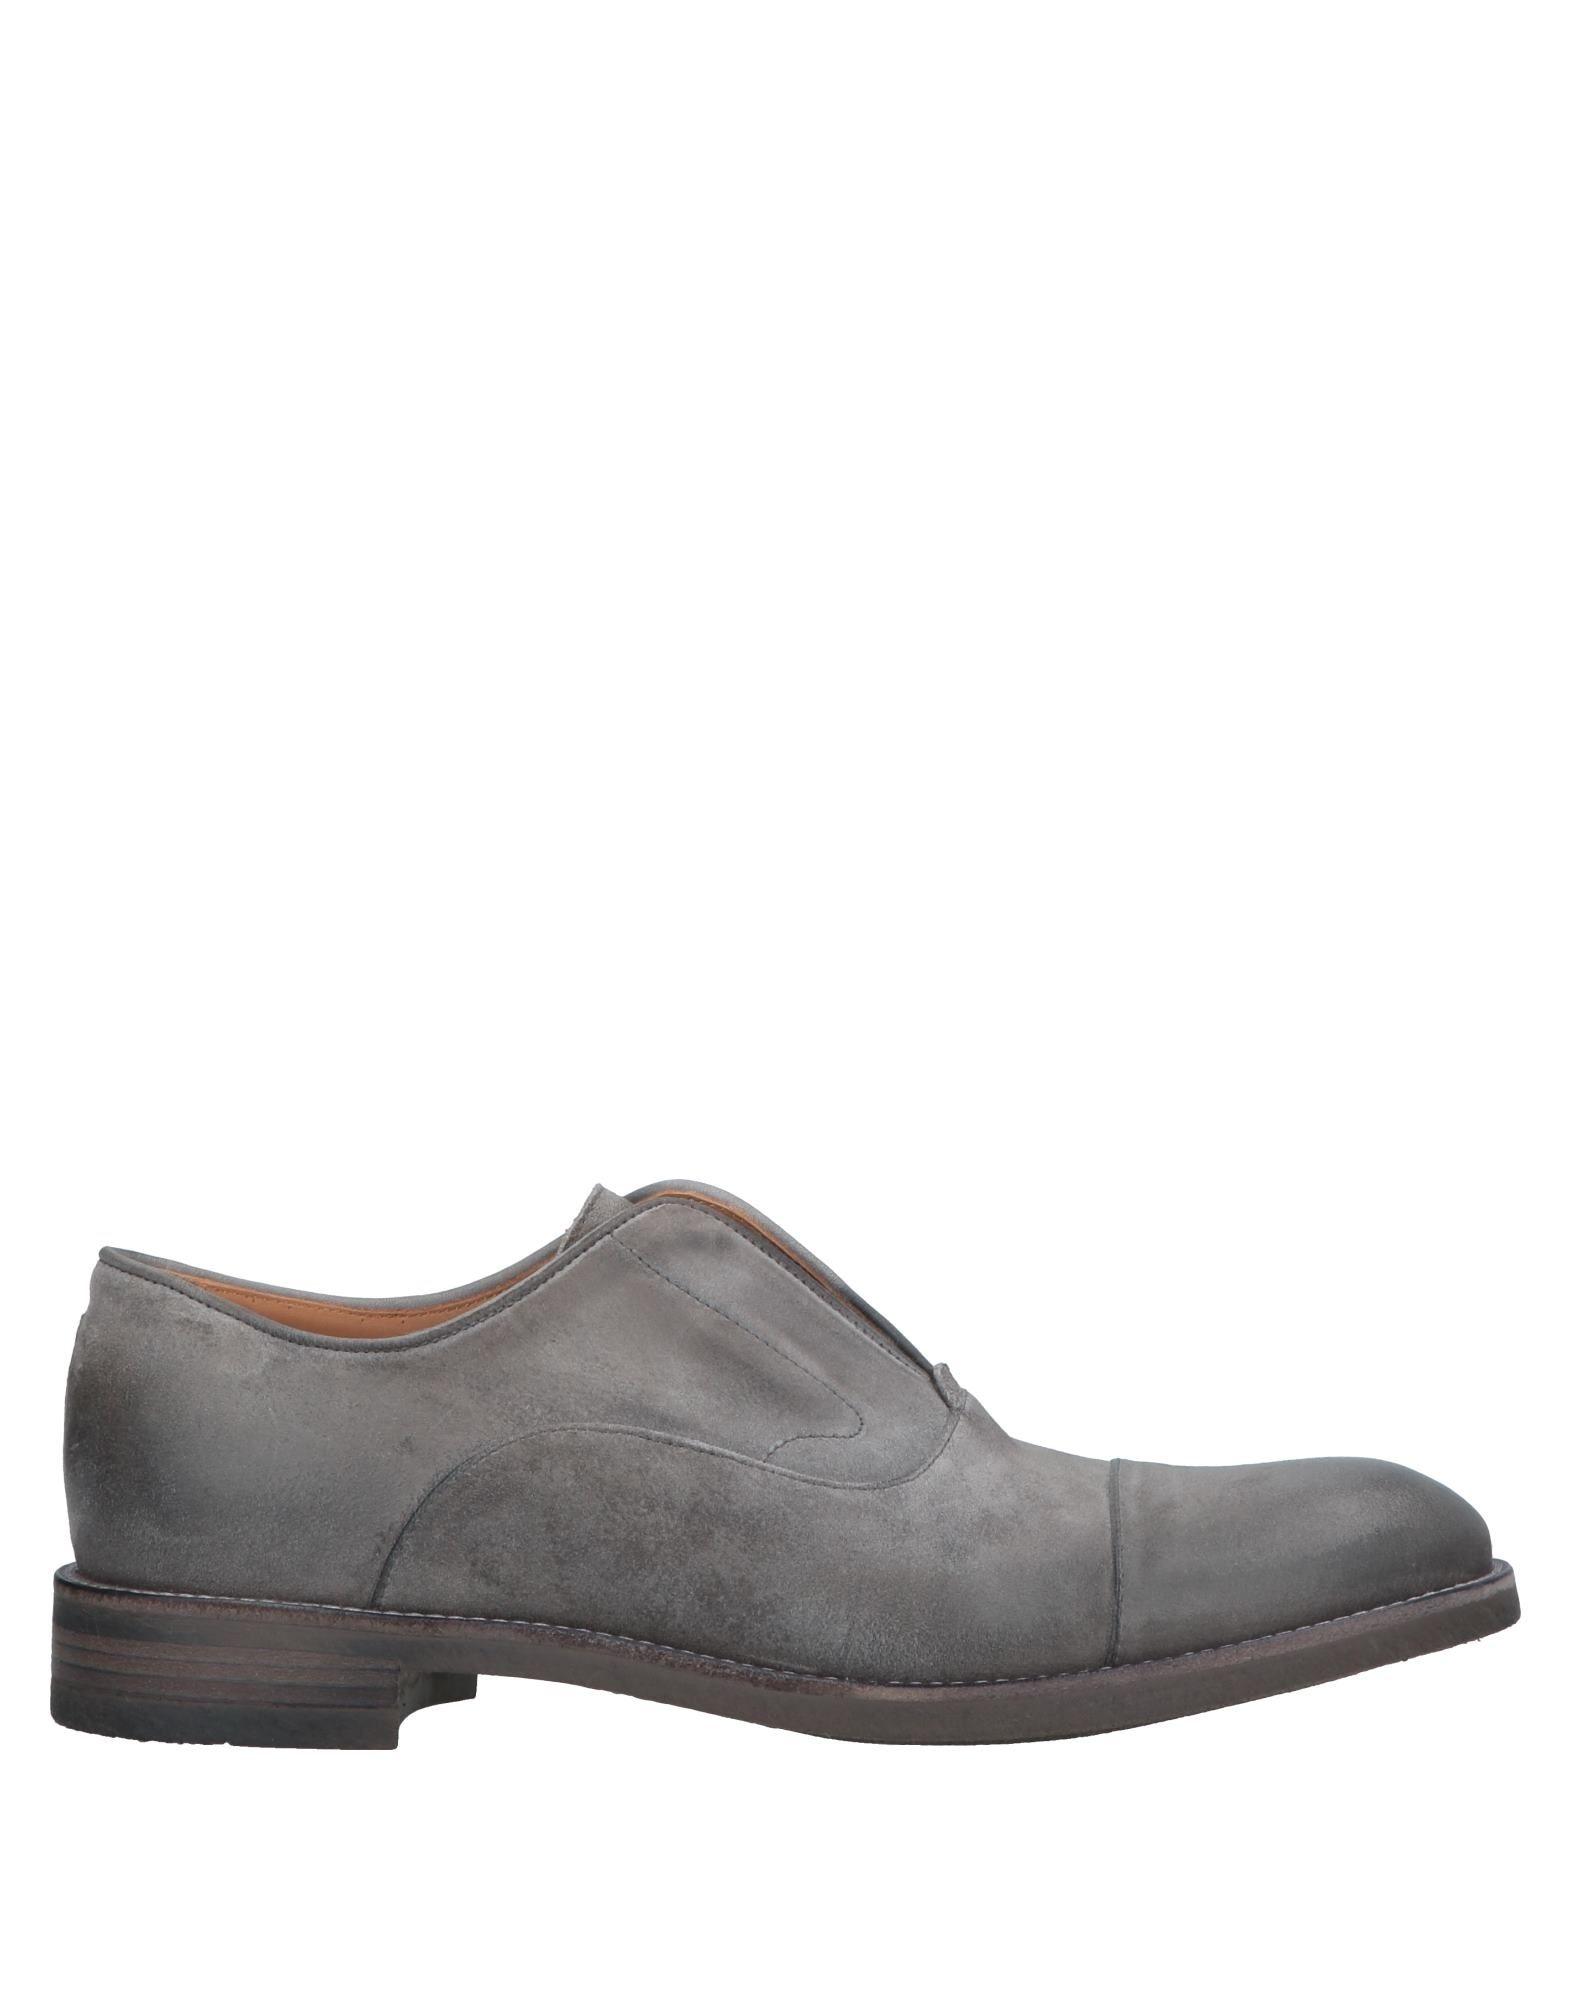 John Varvatos Loafers LOAFERS